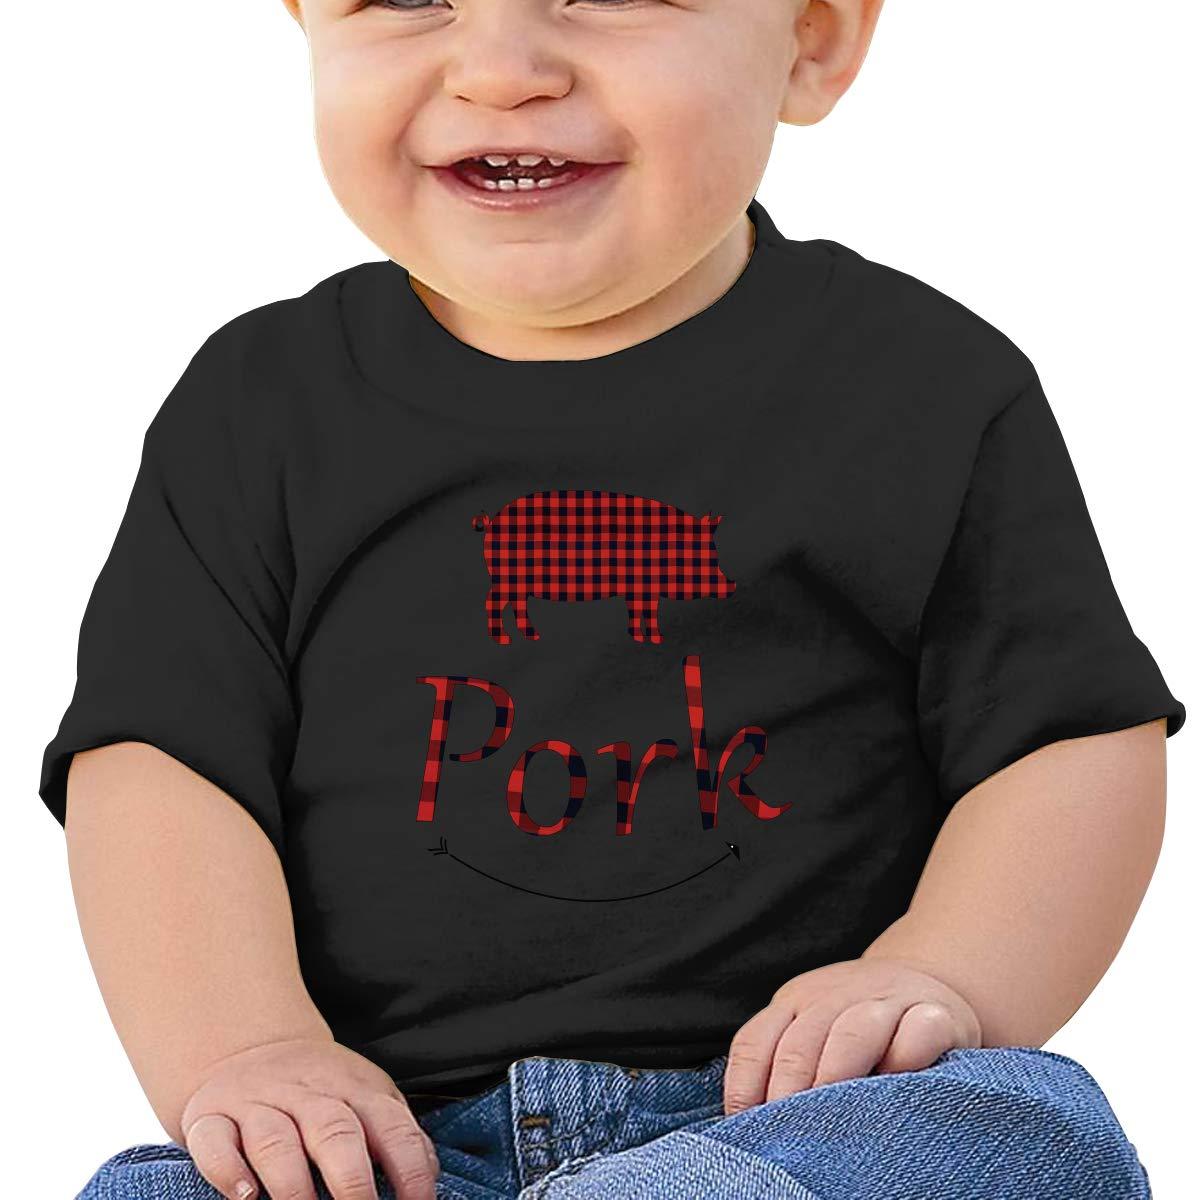 Buffalo Plaid Pig Pork Toddler Short-Sleeve Tee for Boy Girl Infant Kids T-Shirt On Newborn 6-18 Months